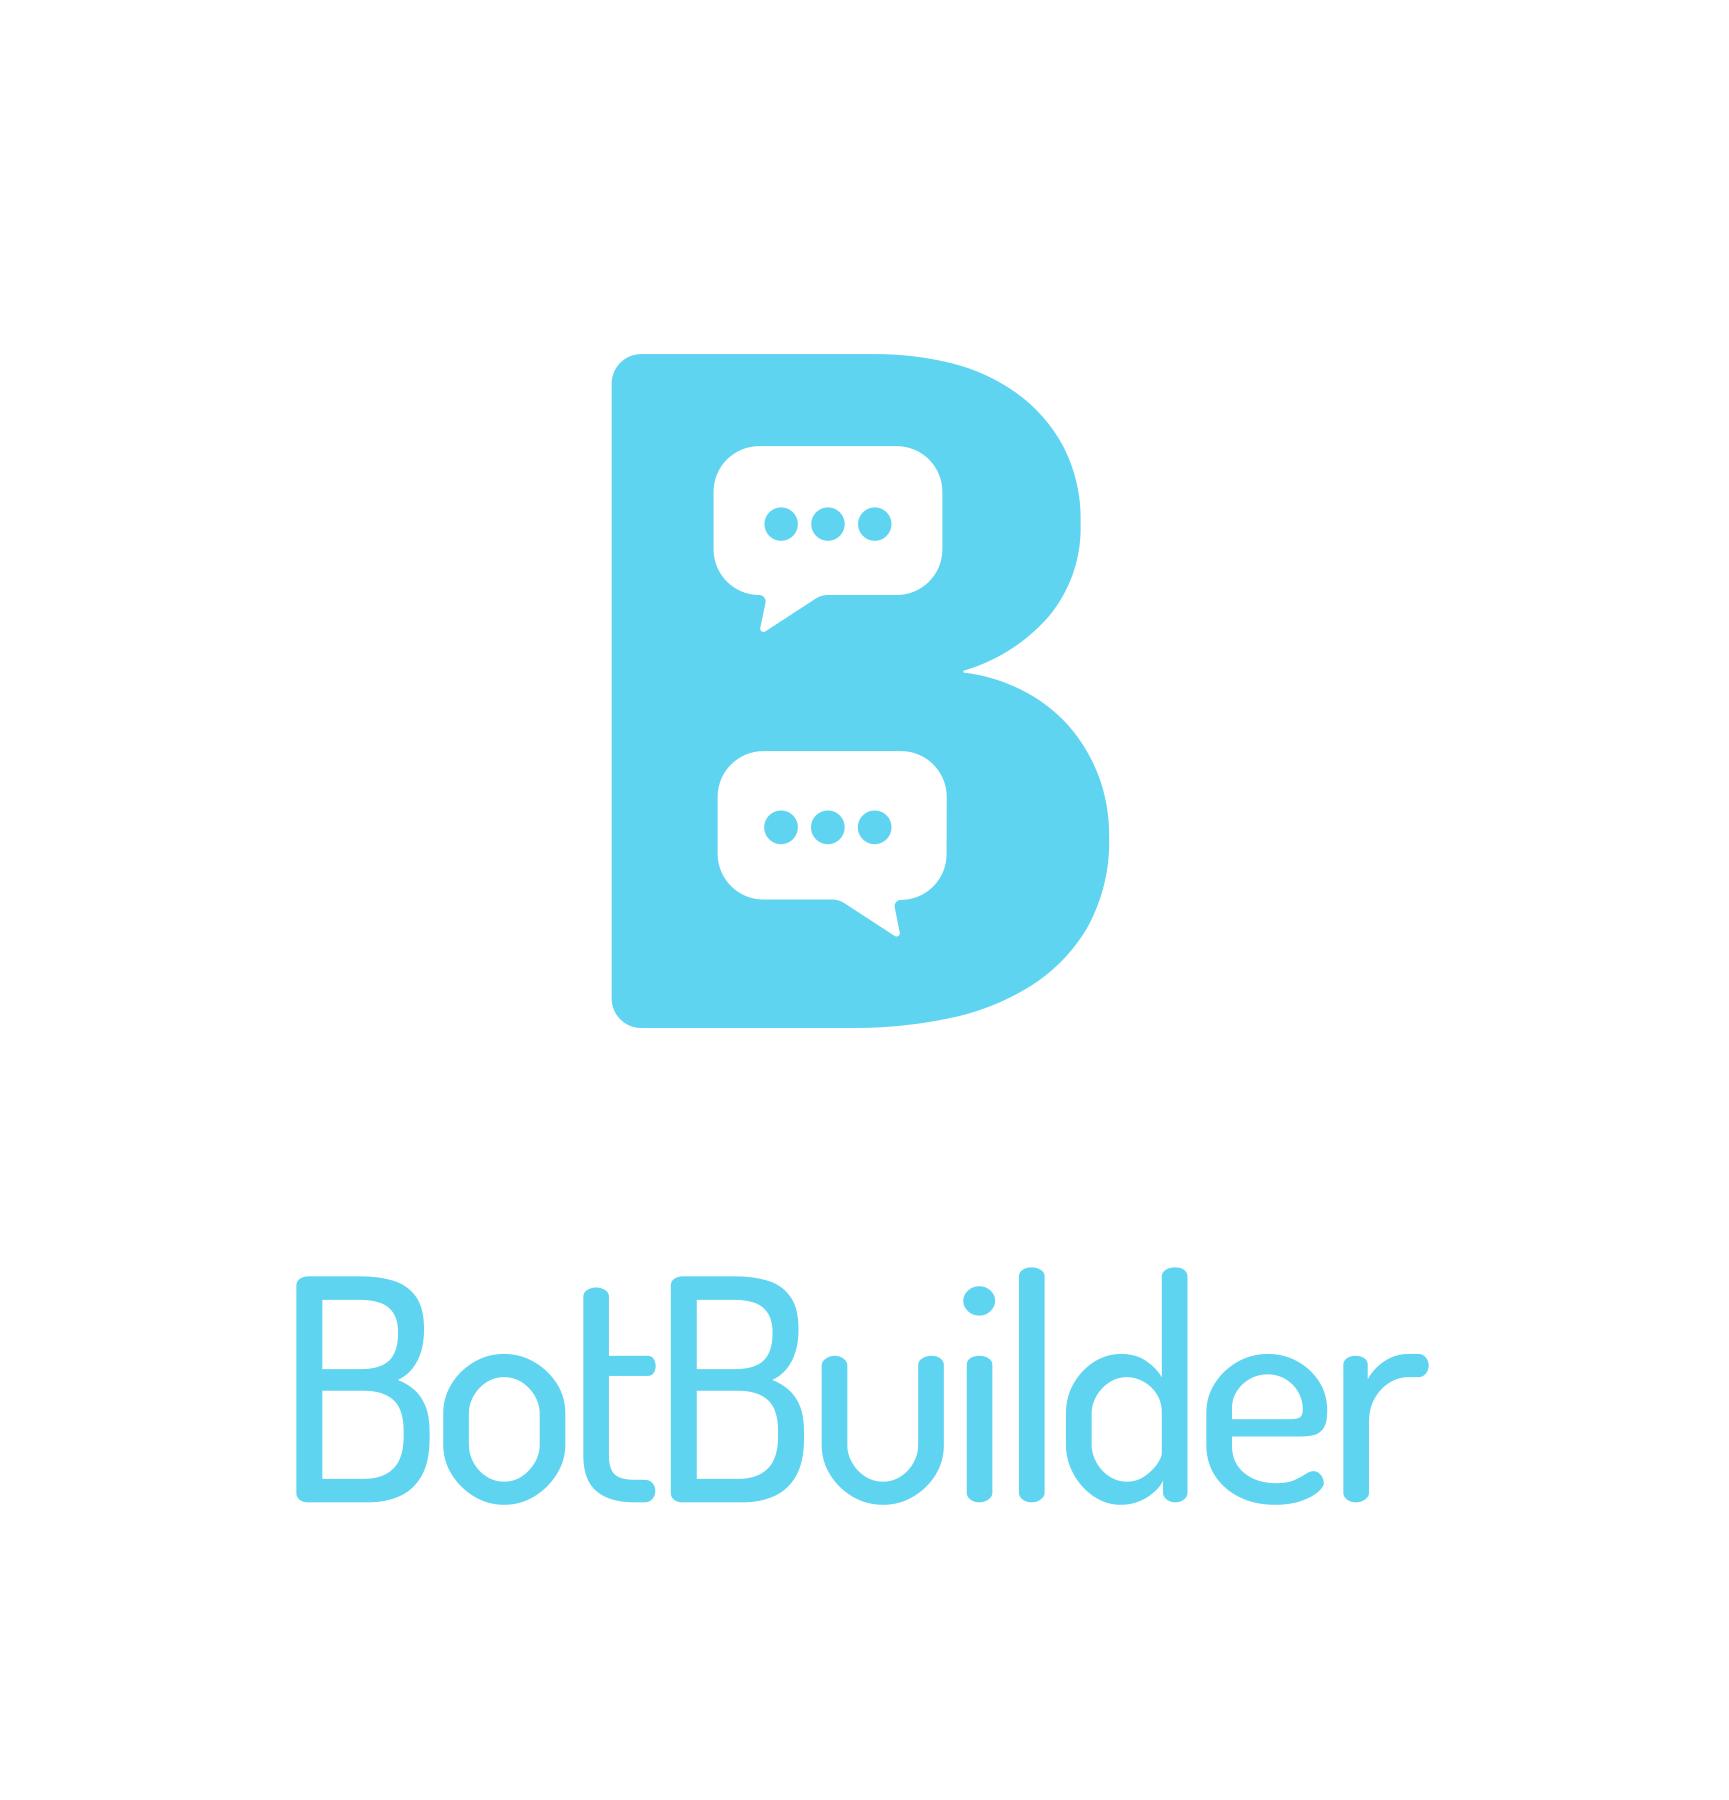 BotBuilder